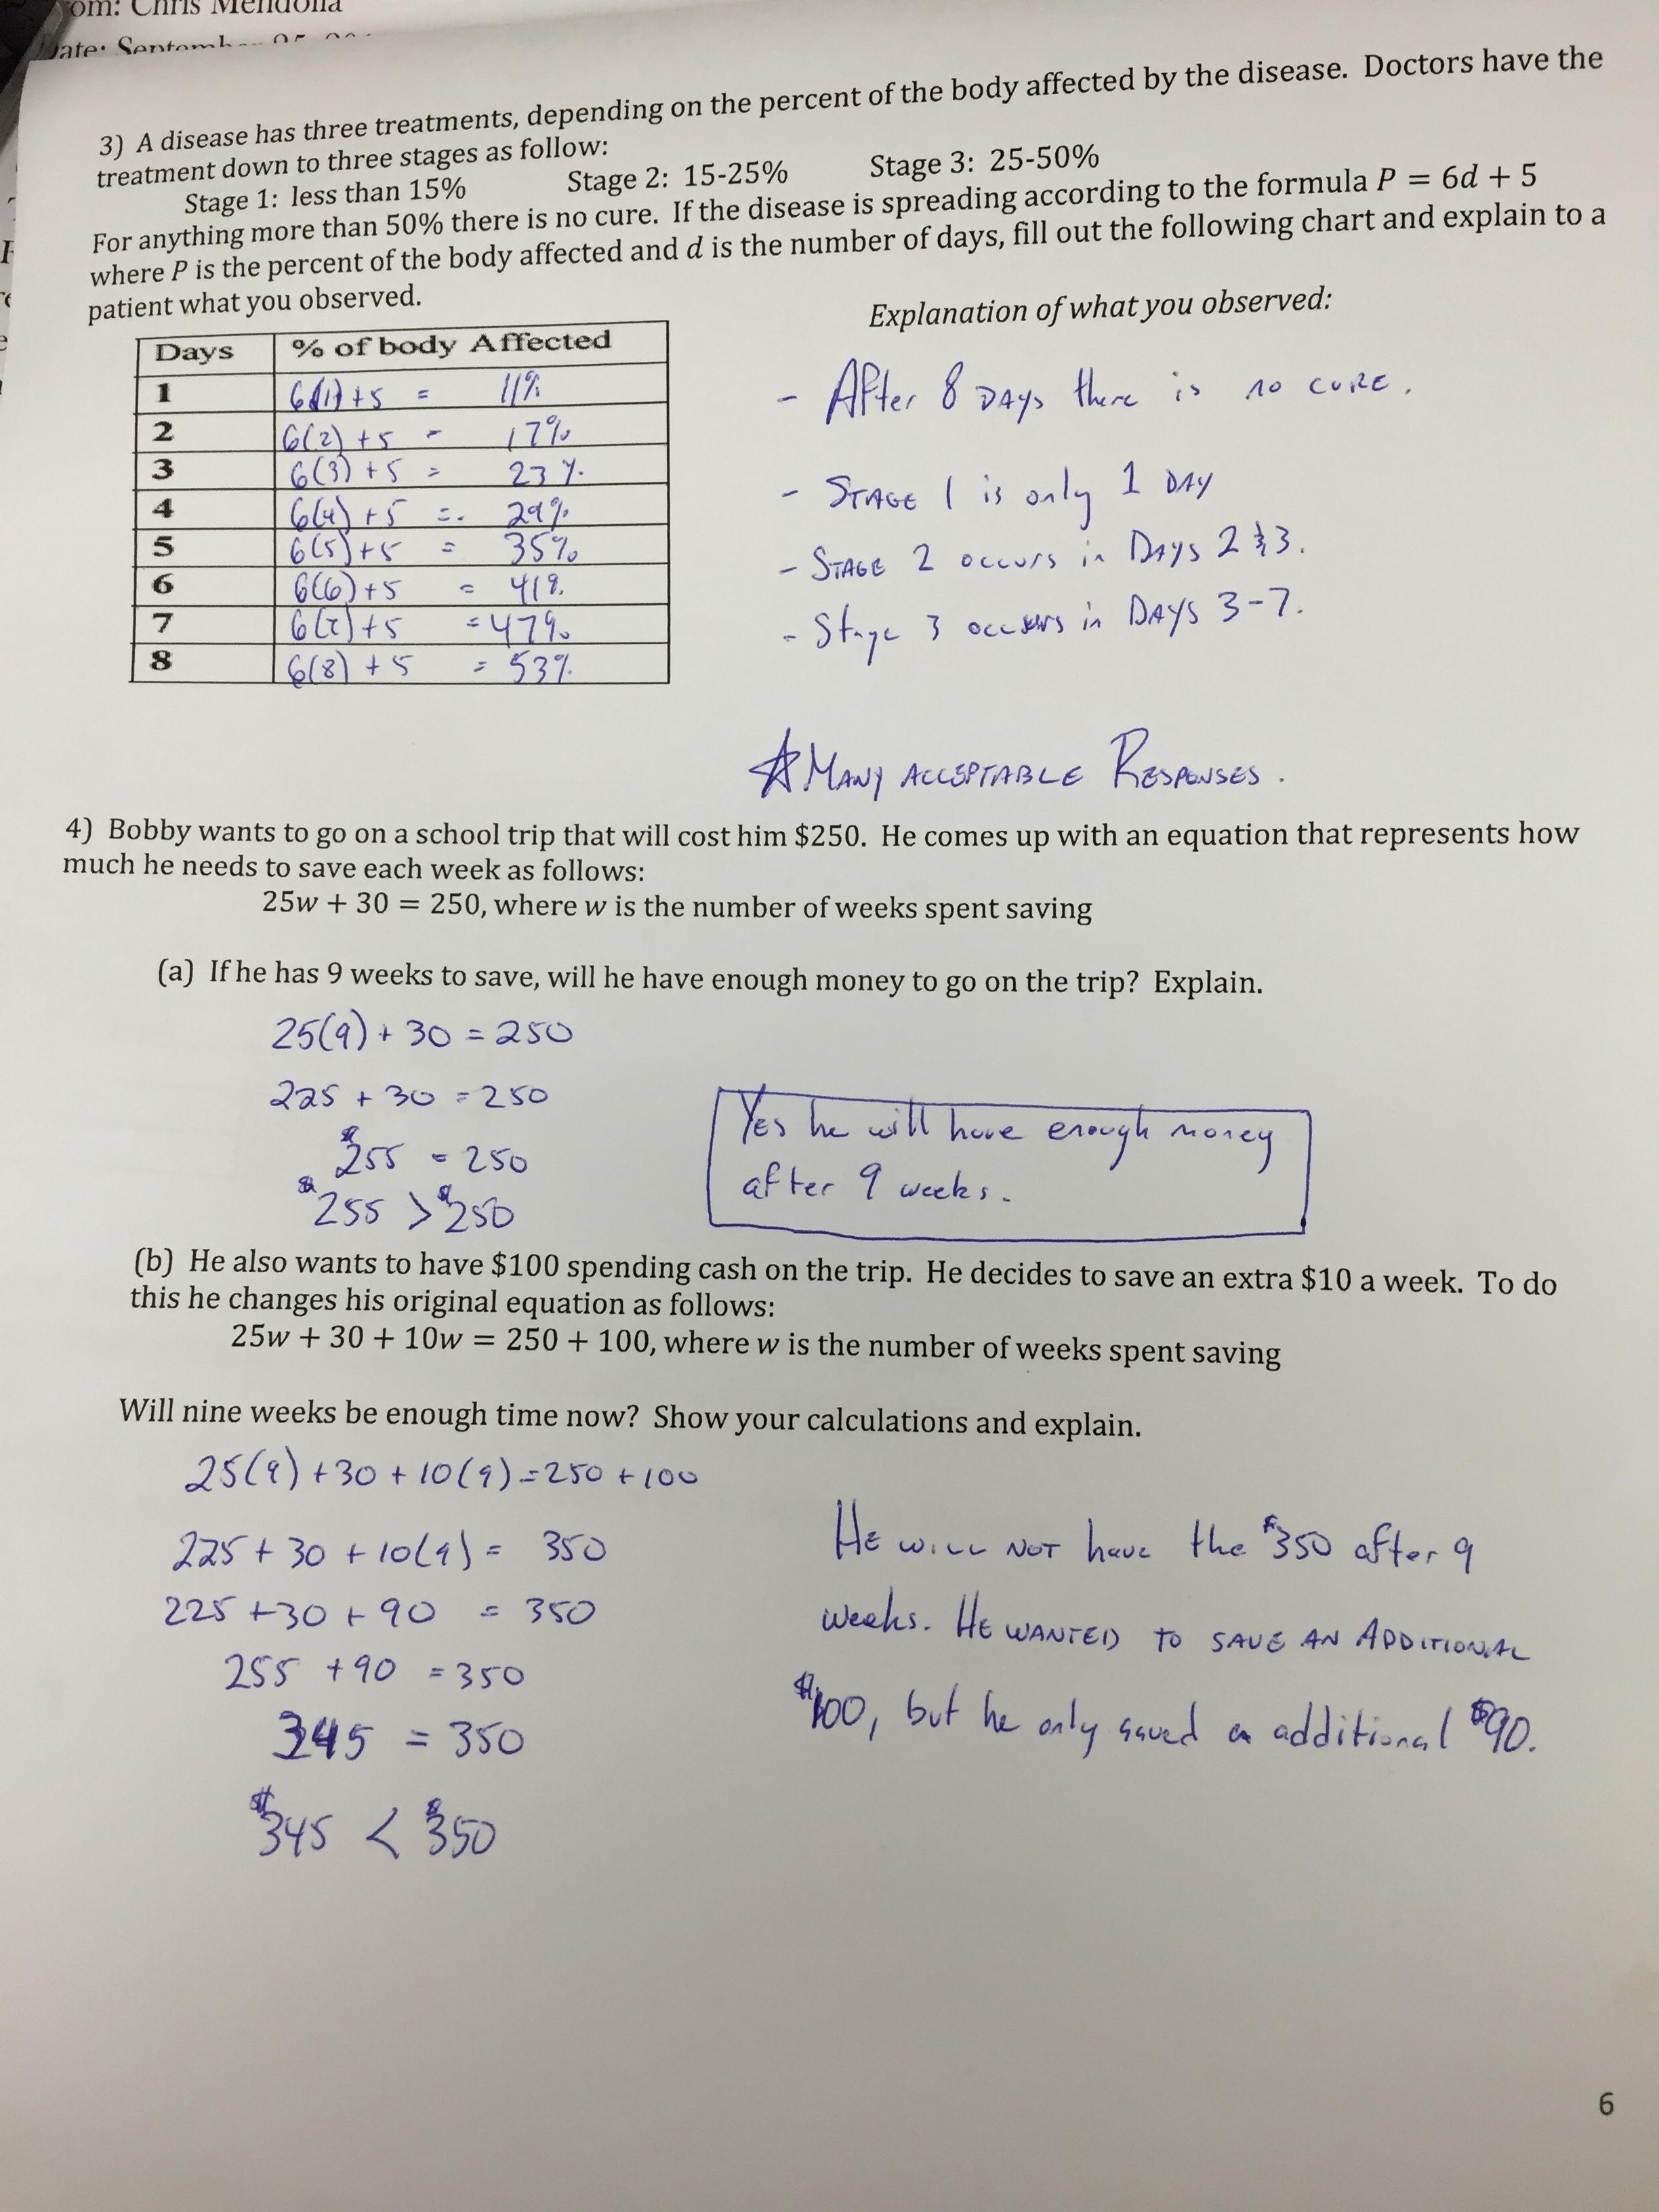 worksheet Law Of Cosines Worksheet Doc www sfponline org uploads76 8142017 536 pm 1573214 back page of law sines and cosines packet jpg 26112 bigitemproblem doc